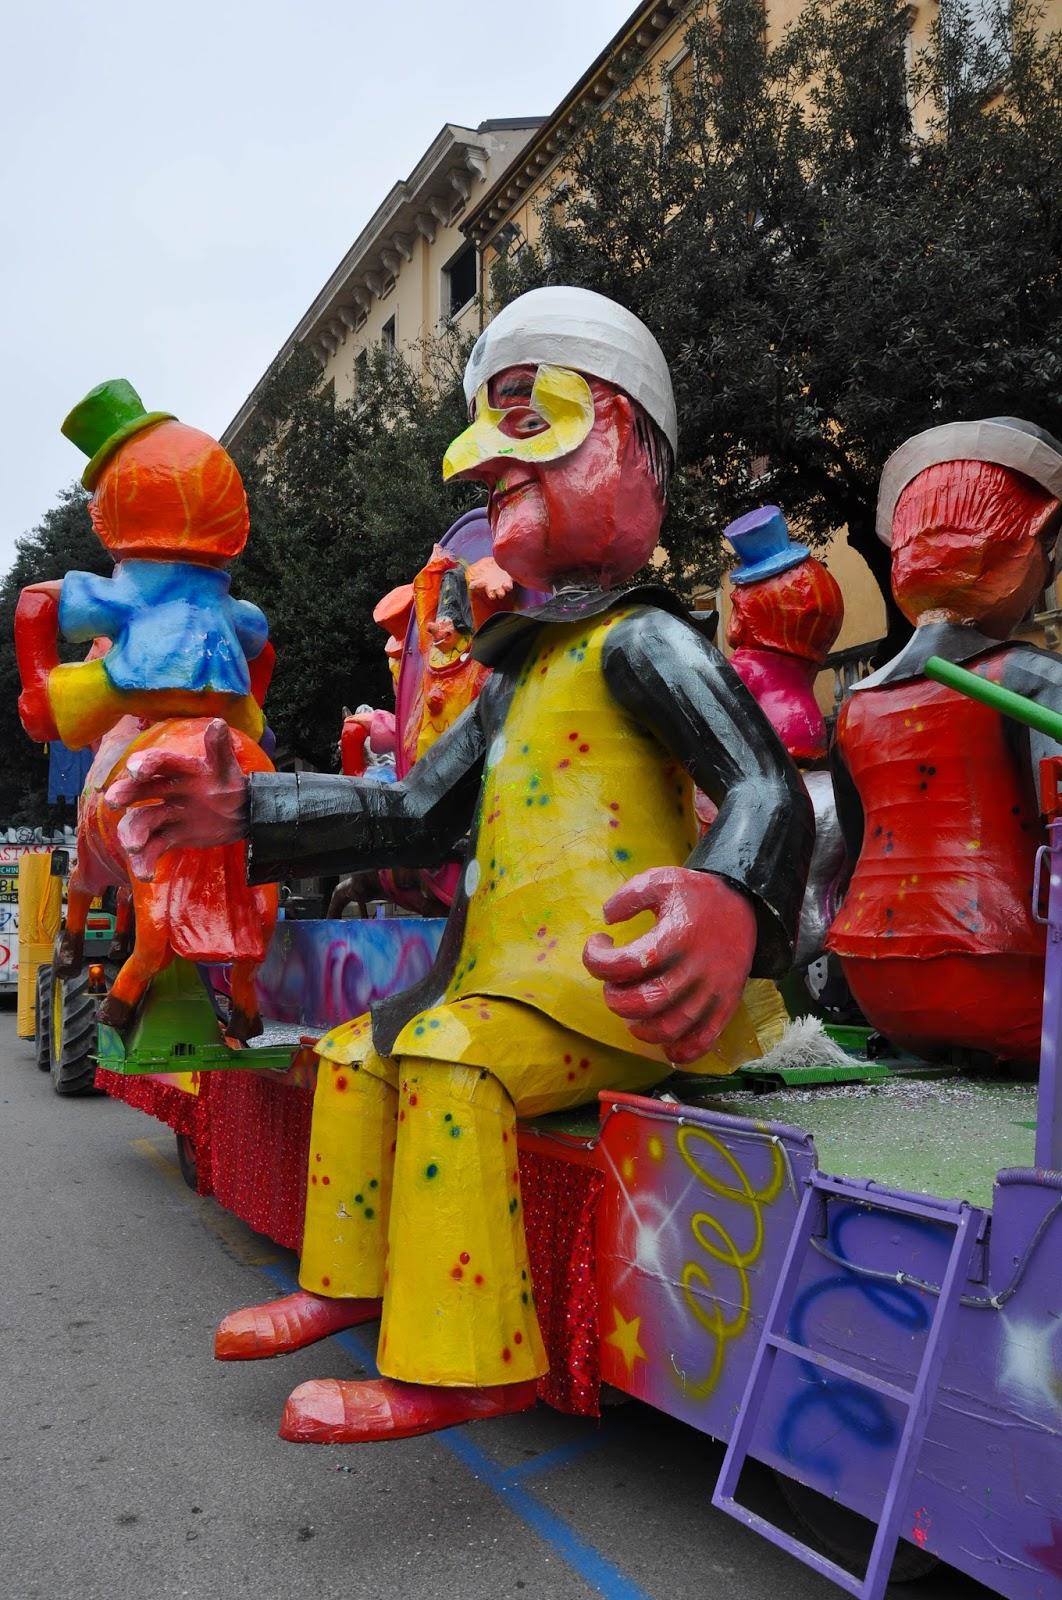 Huge papier mache figures - part of a float at Verona Carnival